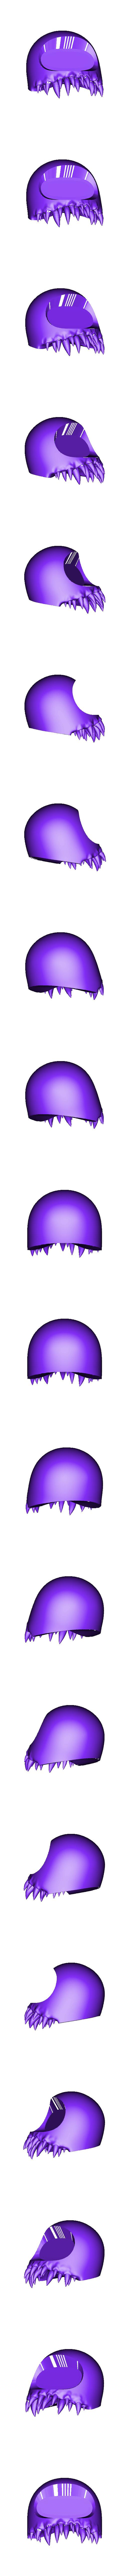 impostBodyUp.obj Download free OBJ file Among Us (easy print)(crew/body/ghost/impostor) • 3D printable template, devanborkhatria